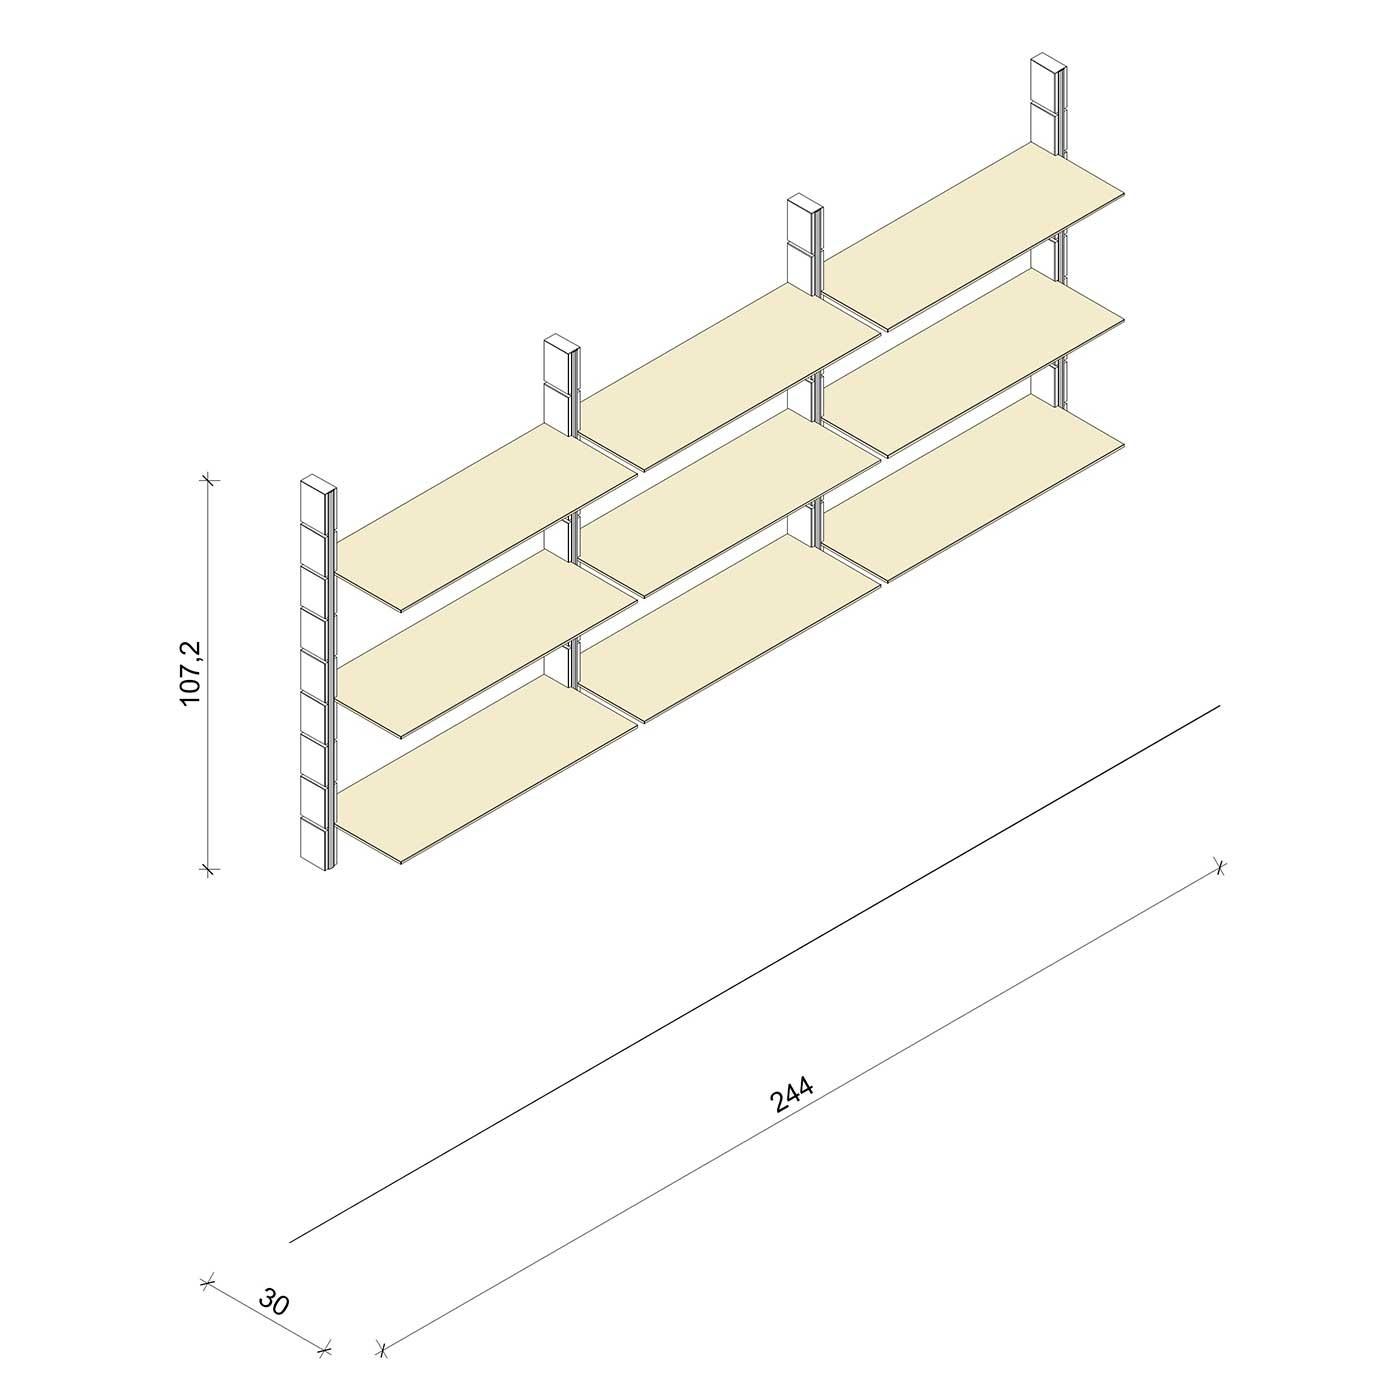 Bücherregal - Prime (M) 244 - Maß: 244 x 107,2 x 30 cm (B x H x T)